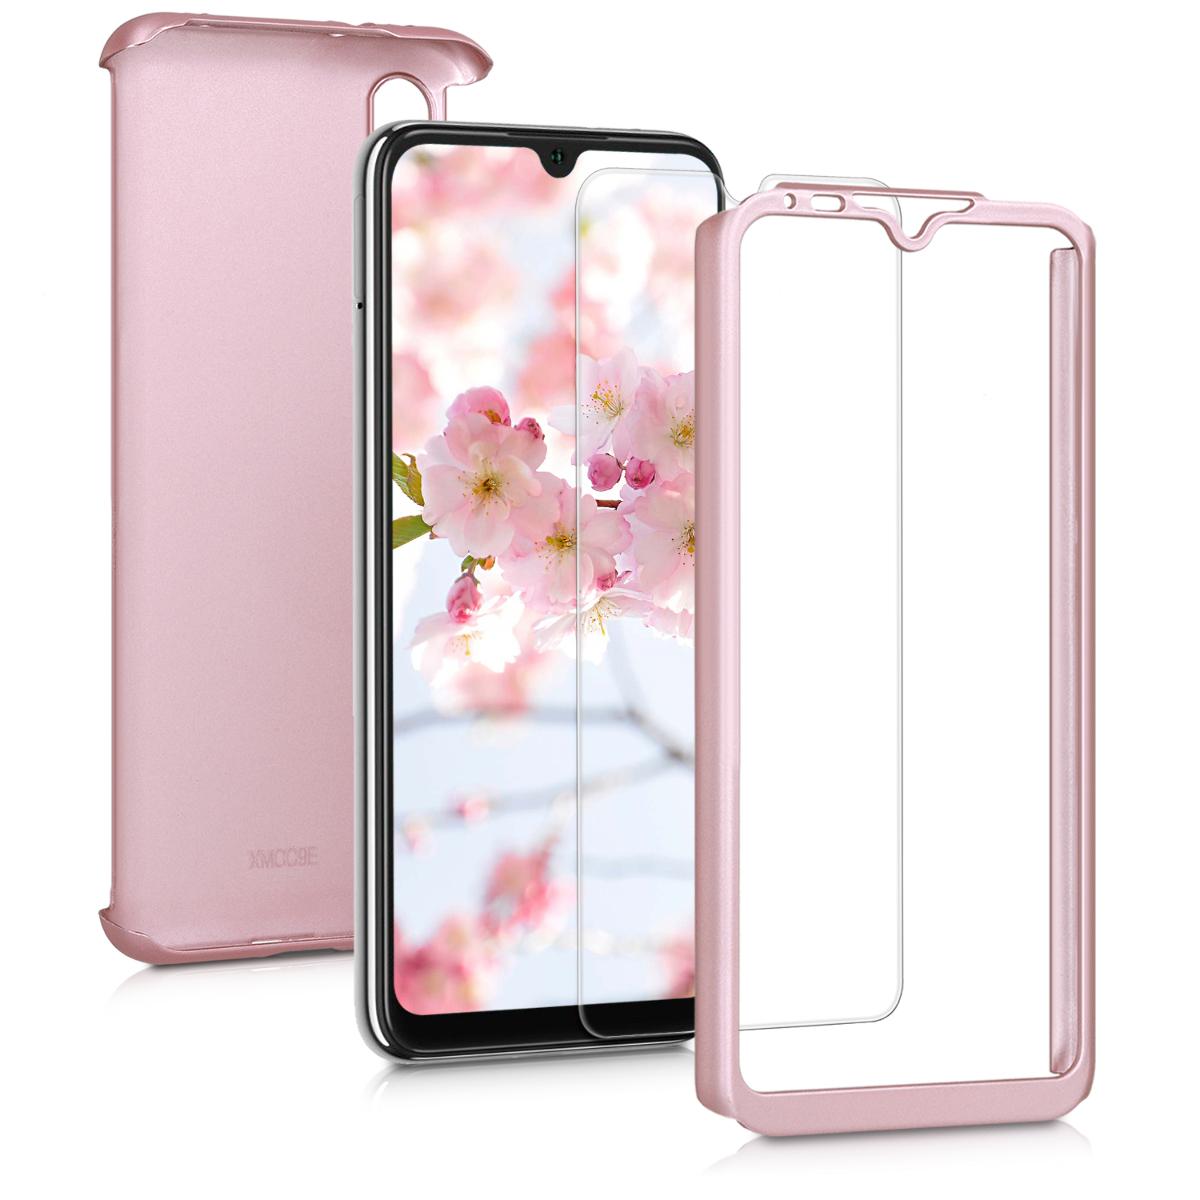 KW Θήκη Full Body Xiaomi Mi A3 & Tempered Glass - Metallic Rose Gold (49678.31)